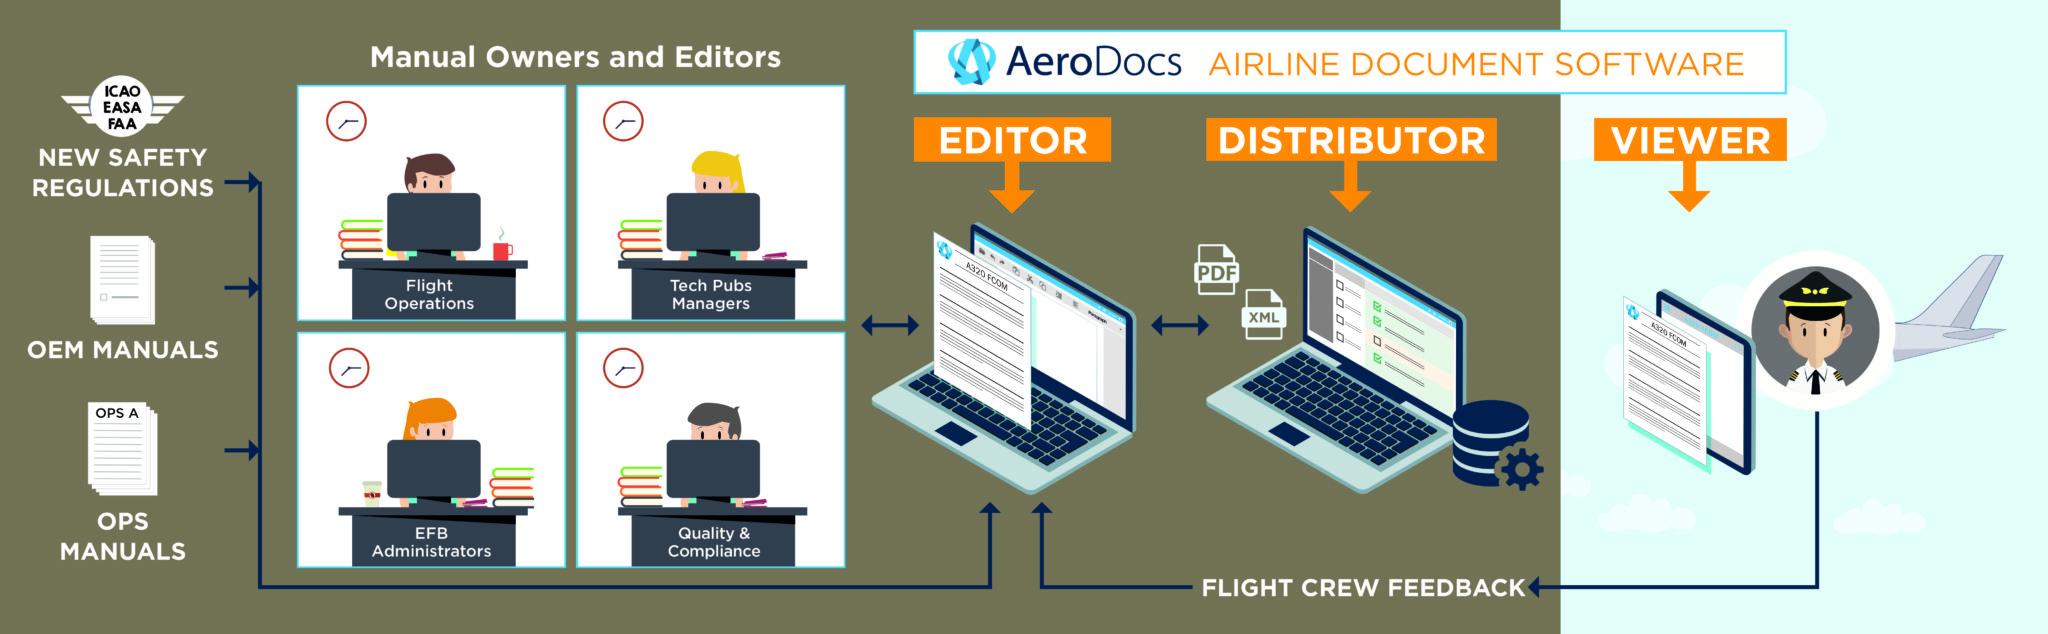 AeroDocs airline document software. Image: Arconics